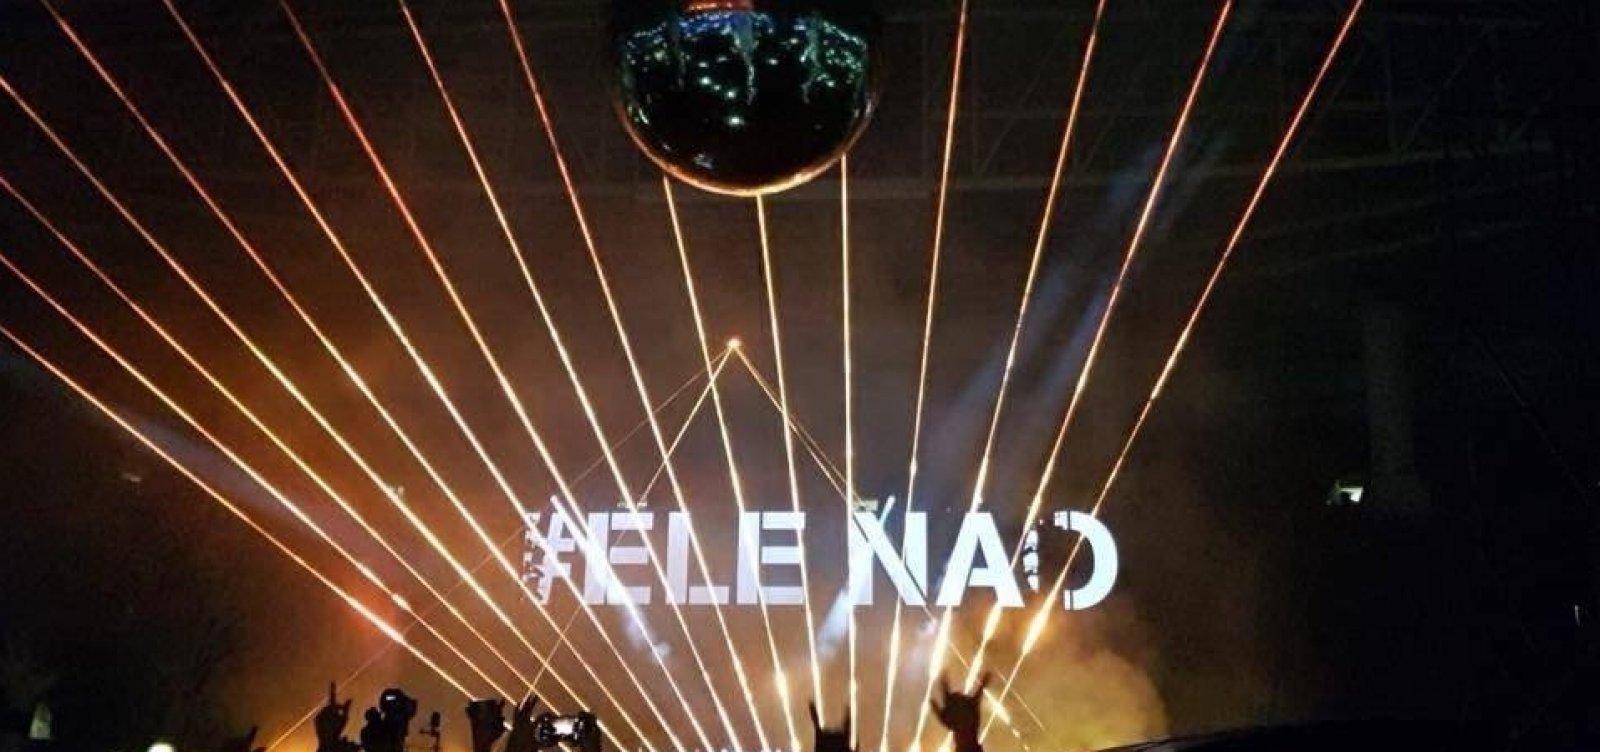 Roger Waters critica Bolsonaro em show de abertura de turnê no Brasil